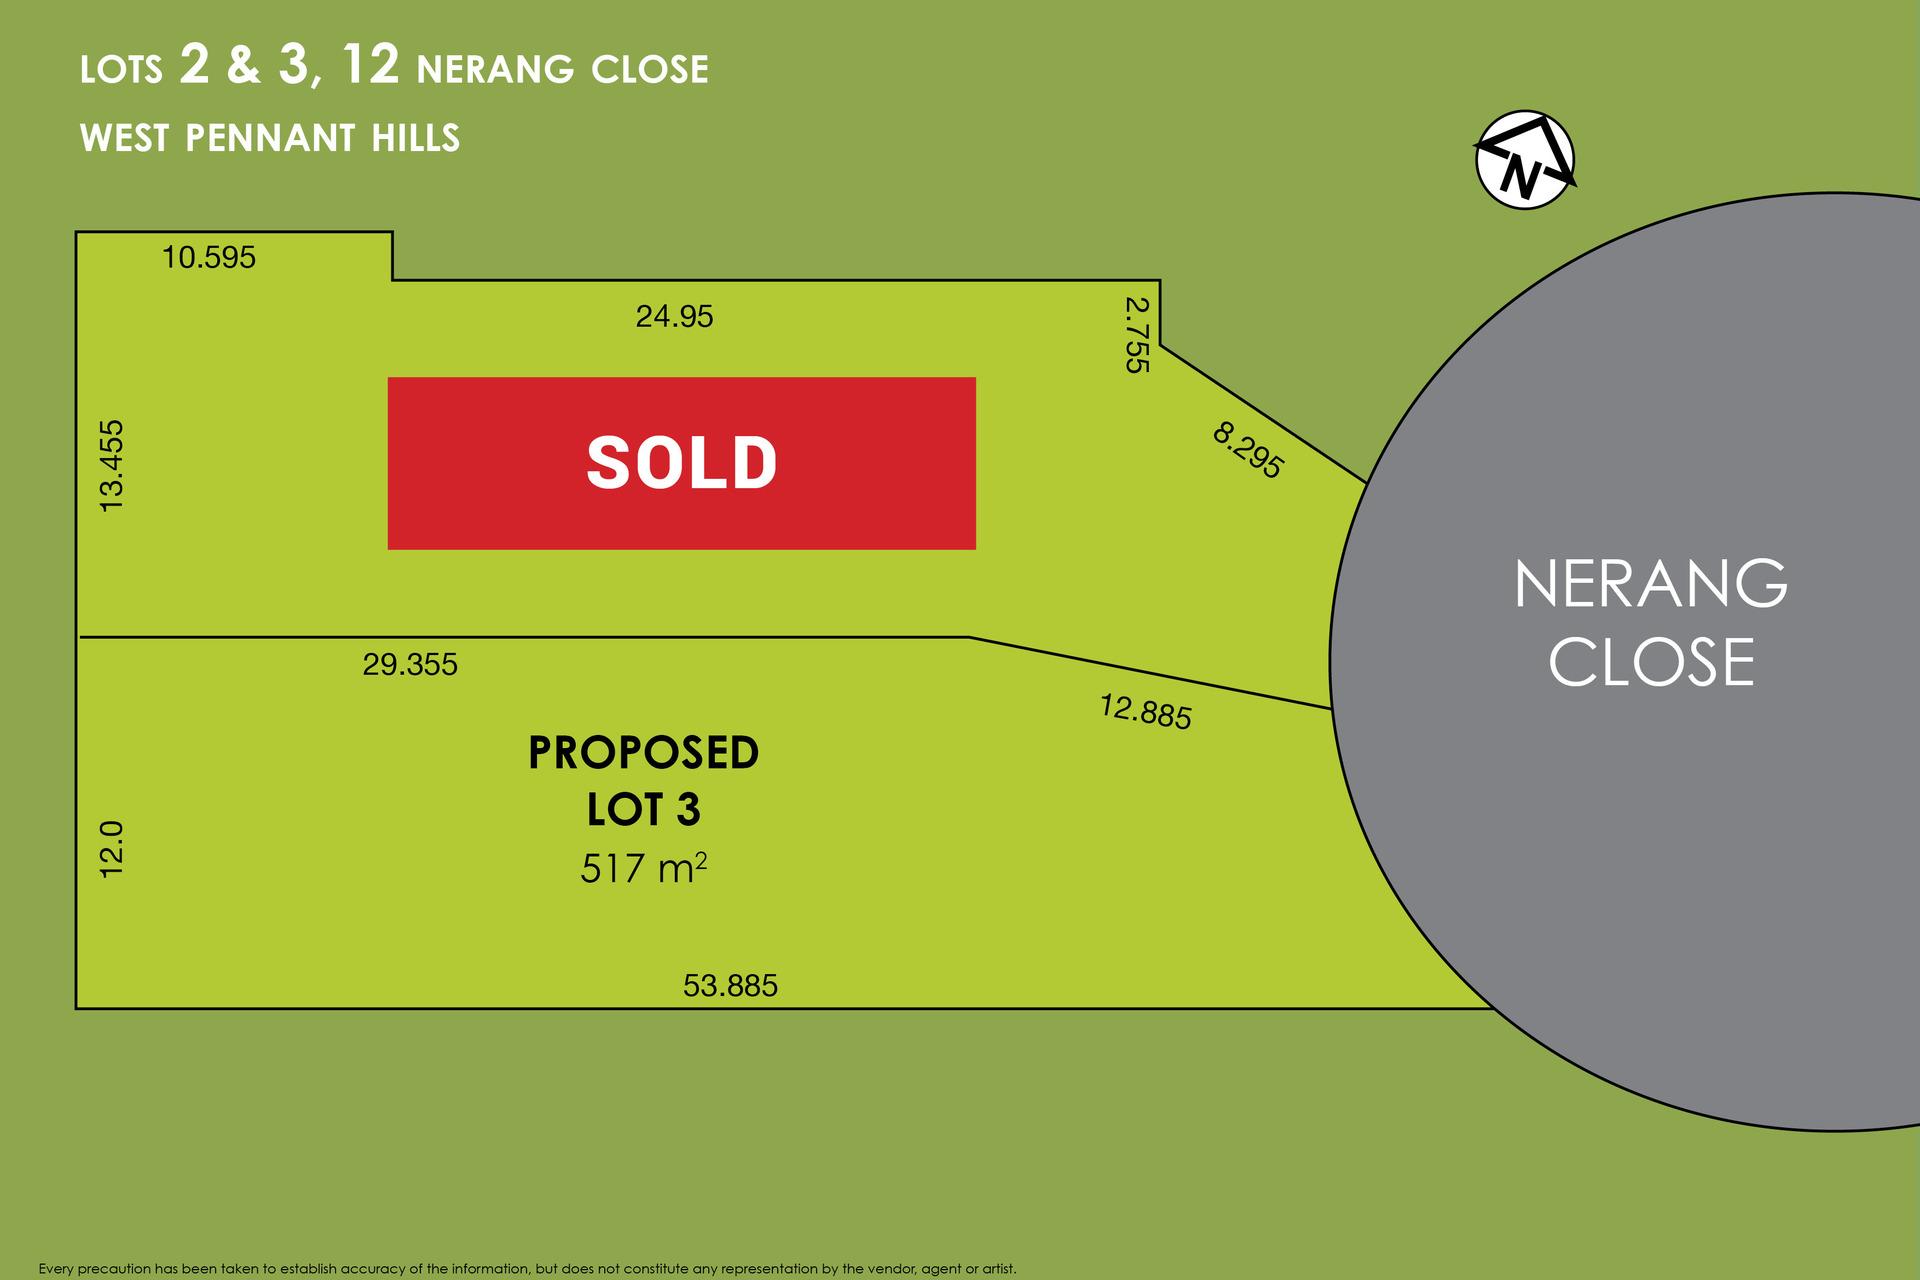 Lot 2, 12 Nerang Close,  West Pennant Hills